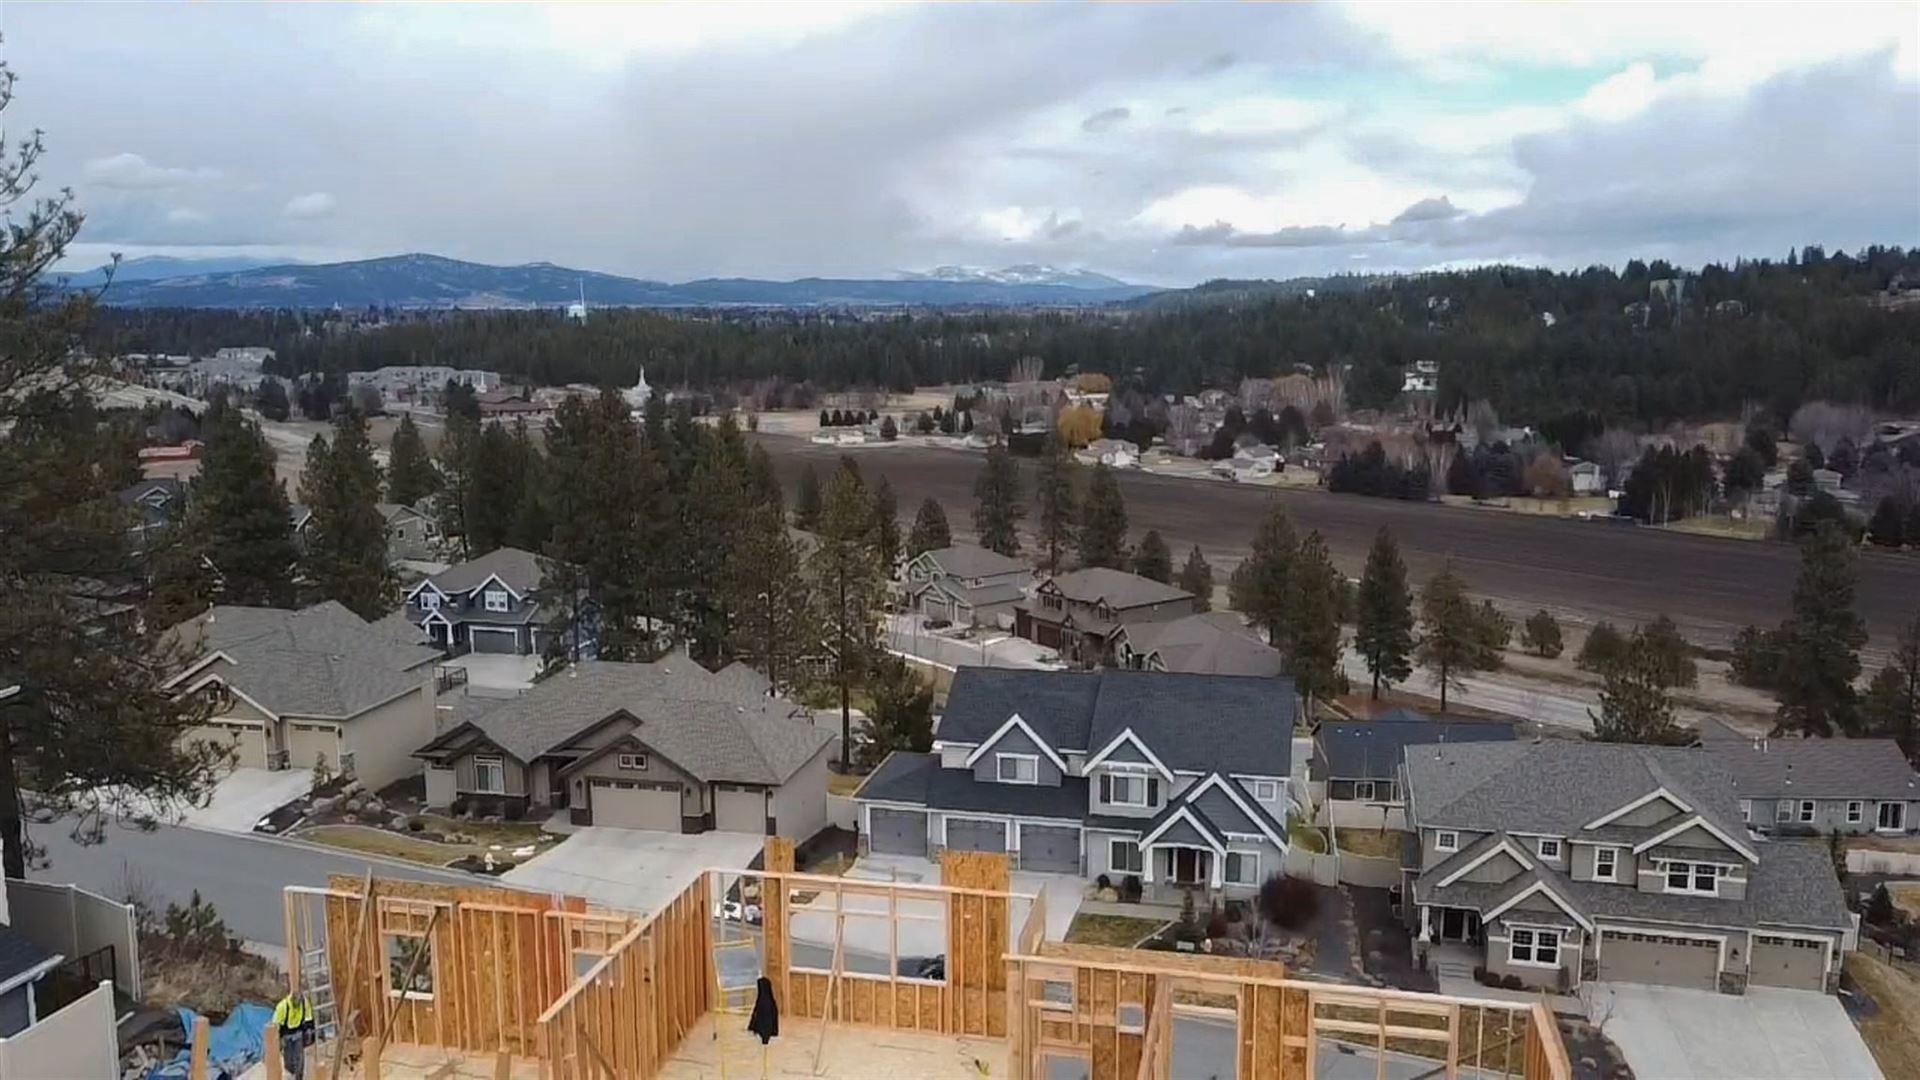 4413 S Selway Ln, Spokane, WA 99206 - #: 202112113